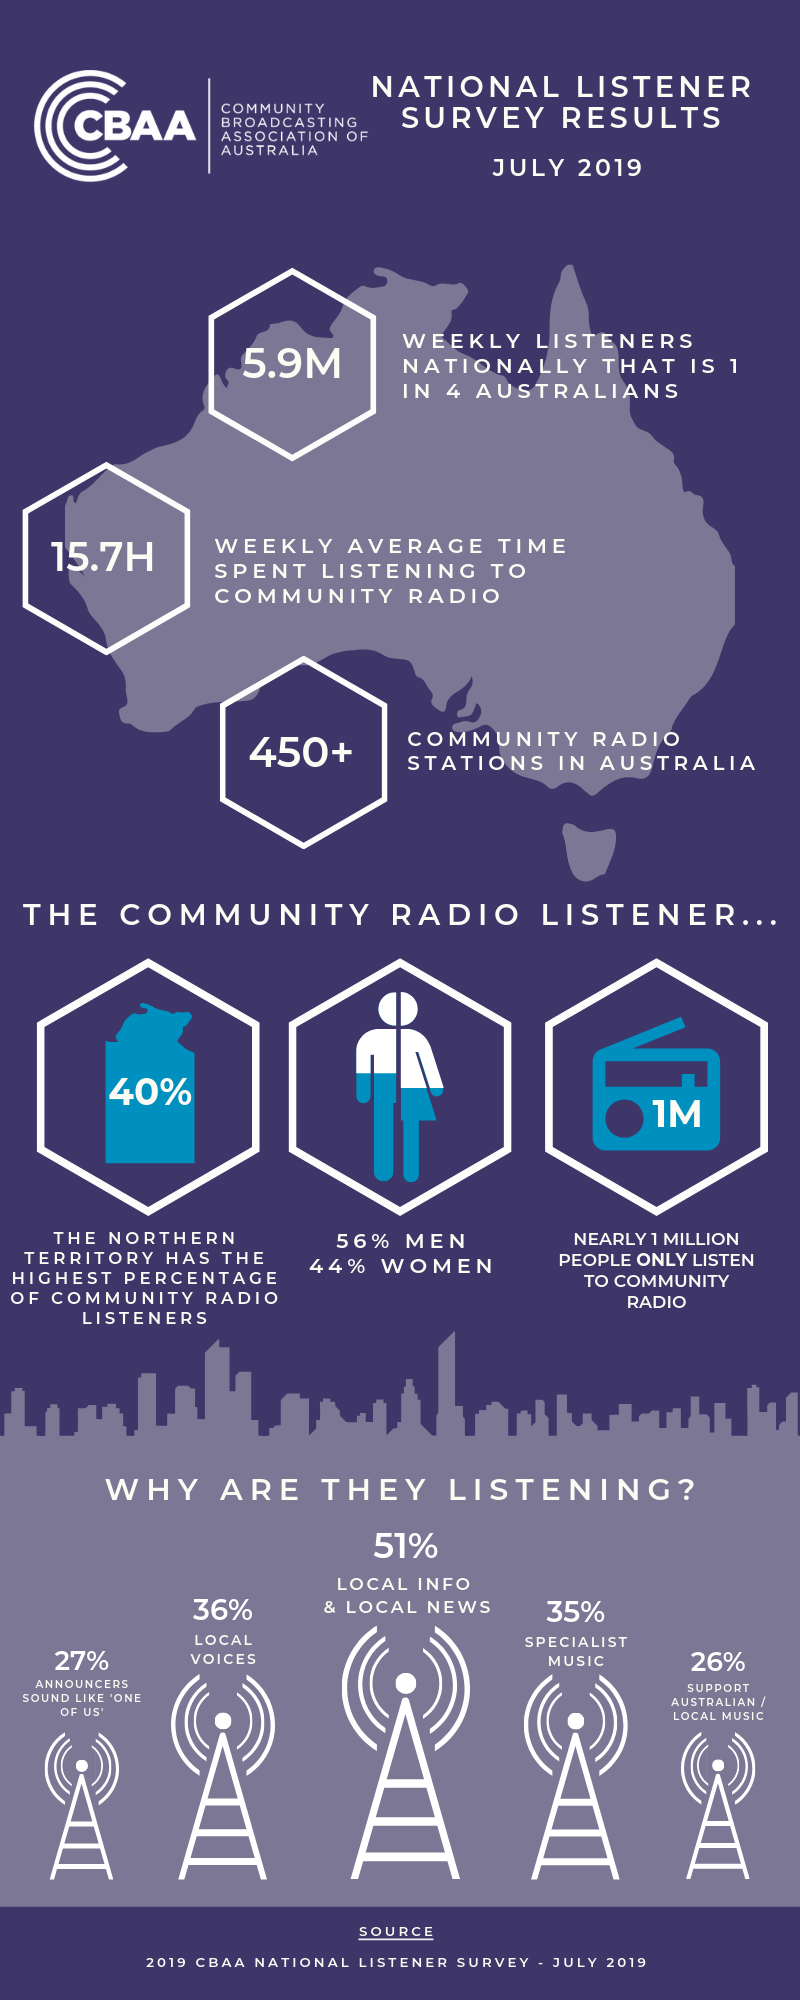 National Listener Survey July 2019 Infographic